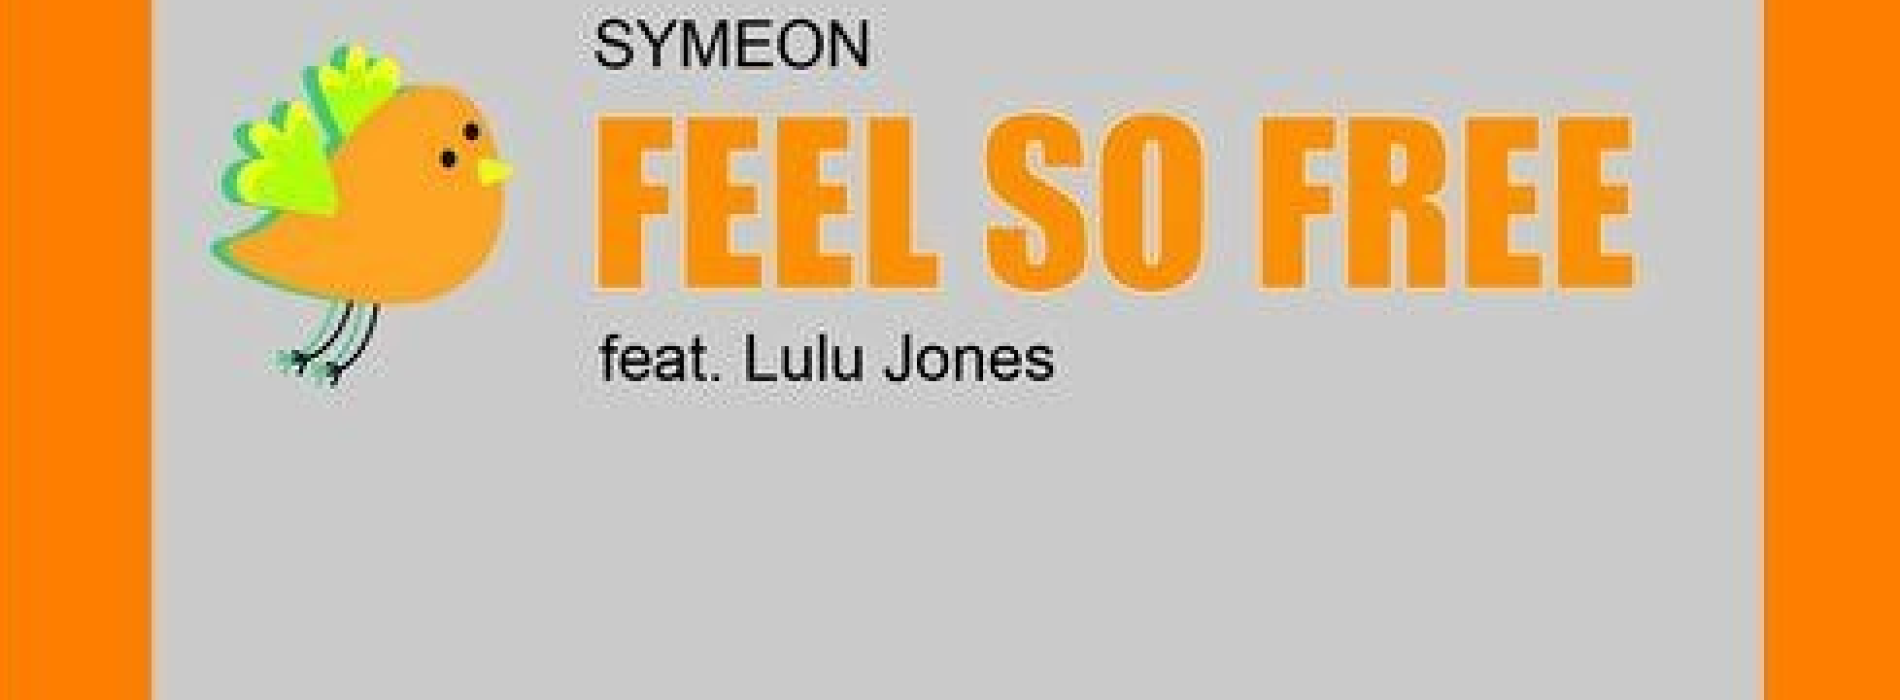 Symeon ft LuLu Jones – Feel So Free (Channa De Silva Remix)